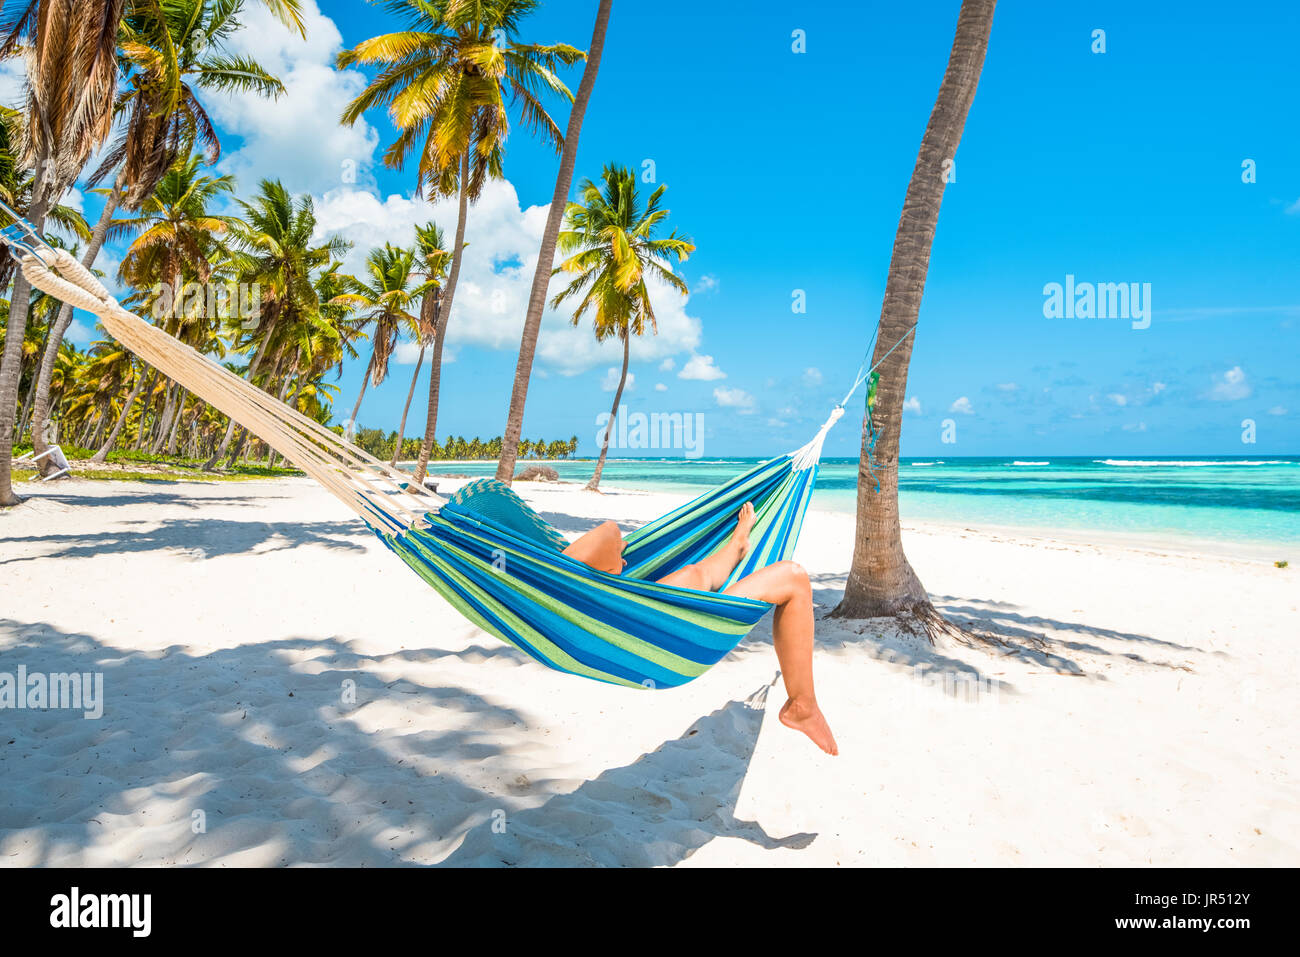 Canto de la Playa, Saona, East National Park (Parque Nacional del Este), Dominikanische Republik, Karibik. Frau entspannen auf einer Hängematte. Stockbild